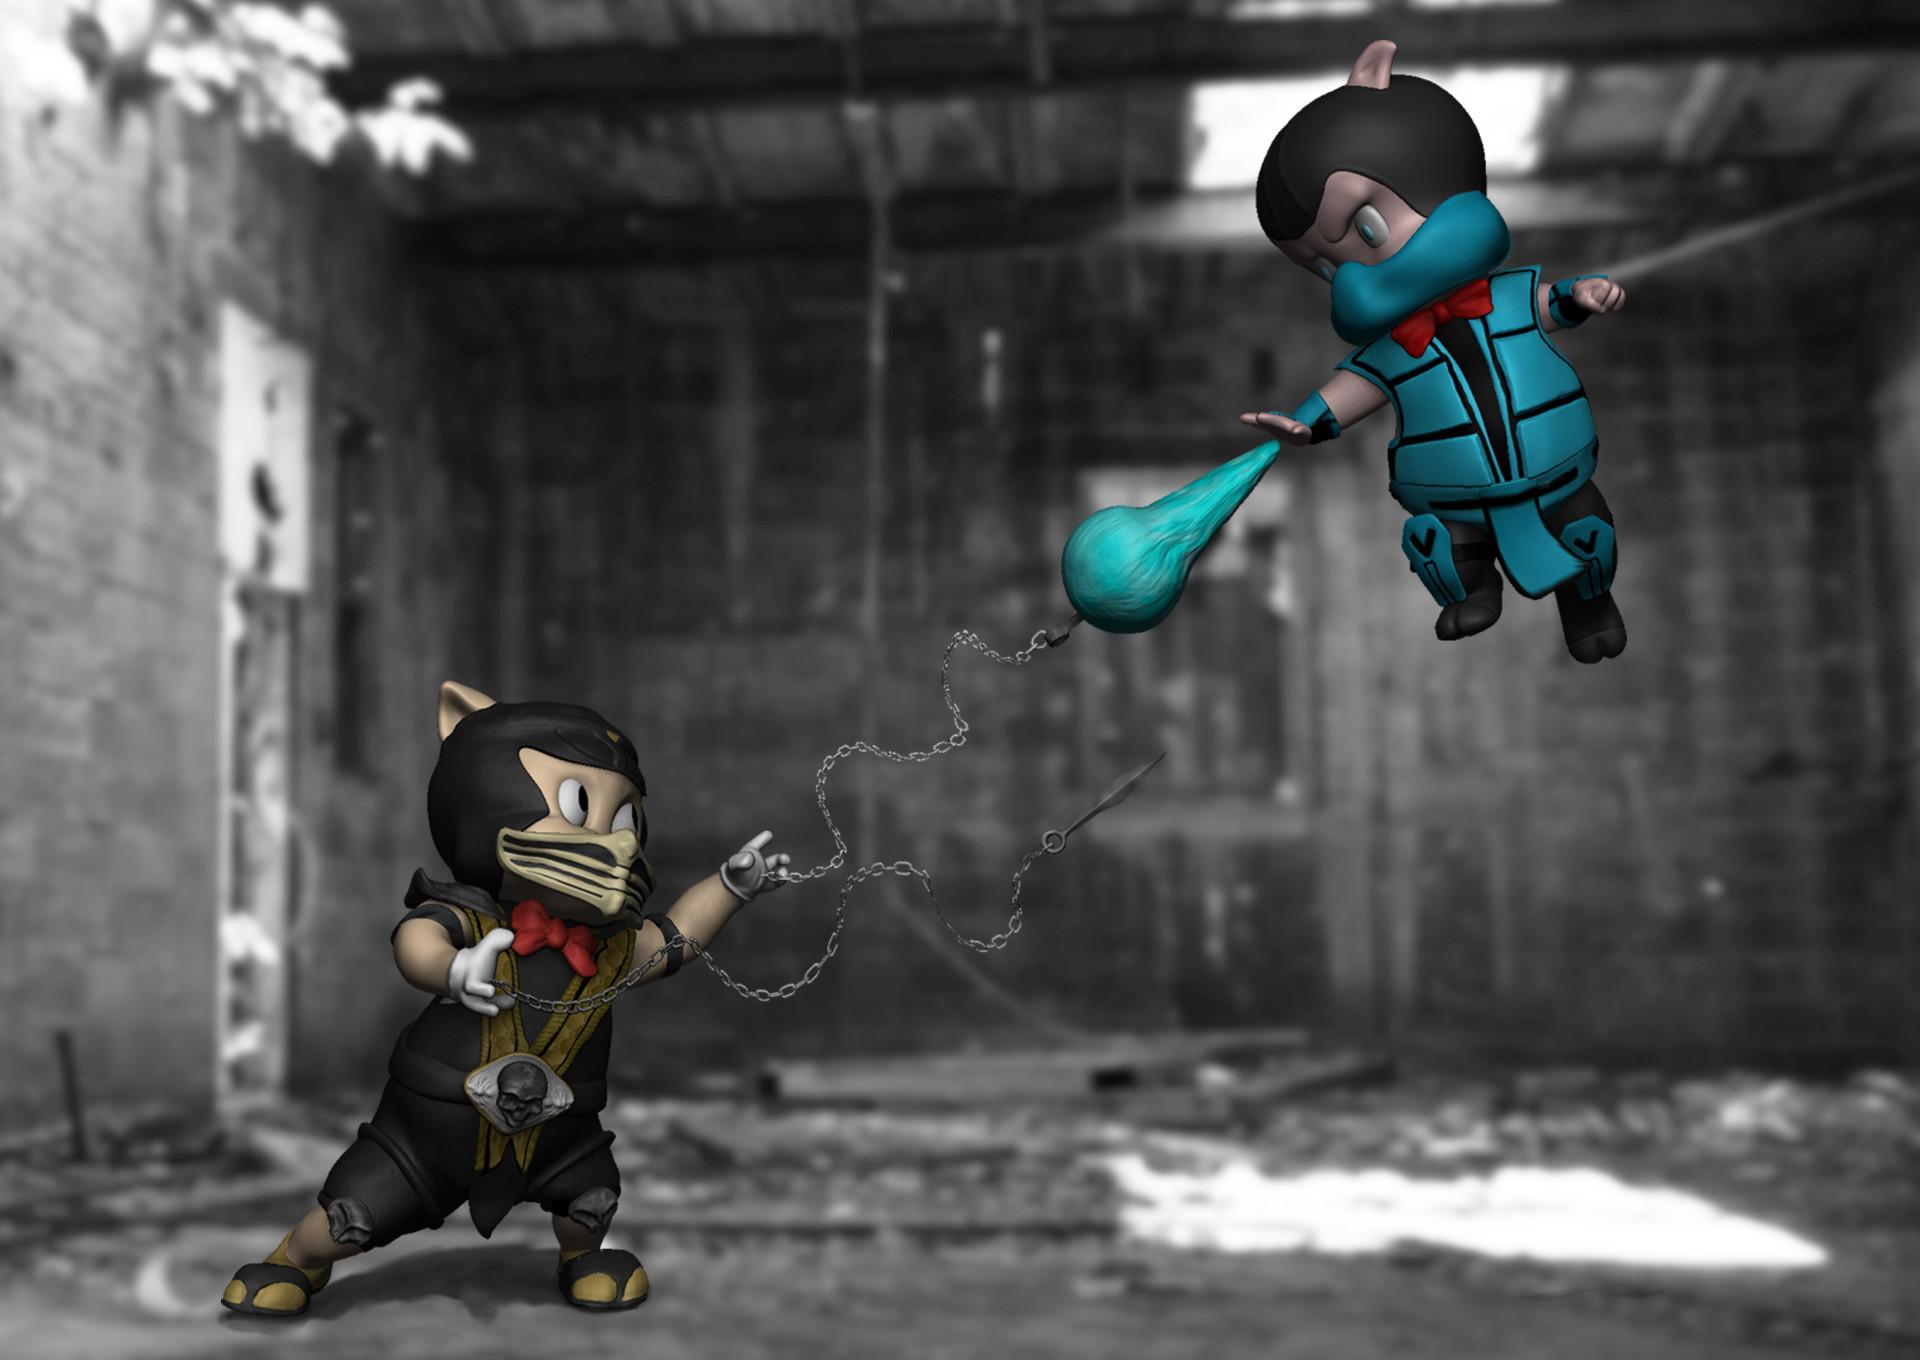 Terressa Cook 3D Animator| 3D Artist - Porky Pig/Scorpion vs